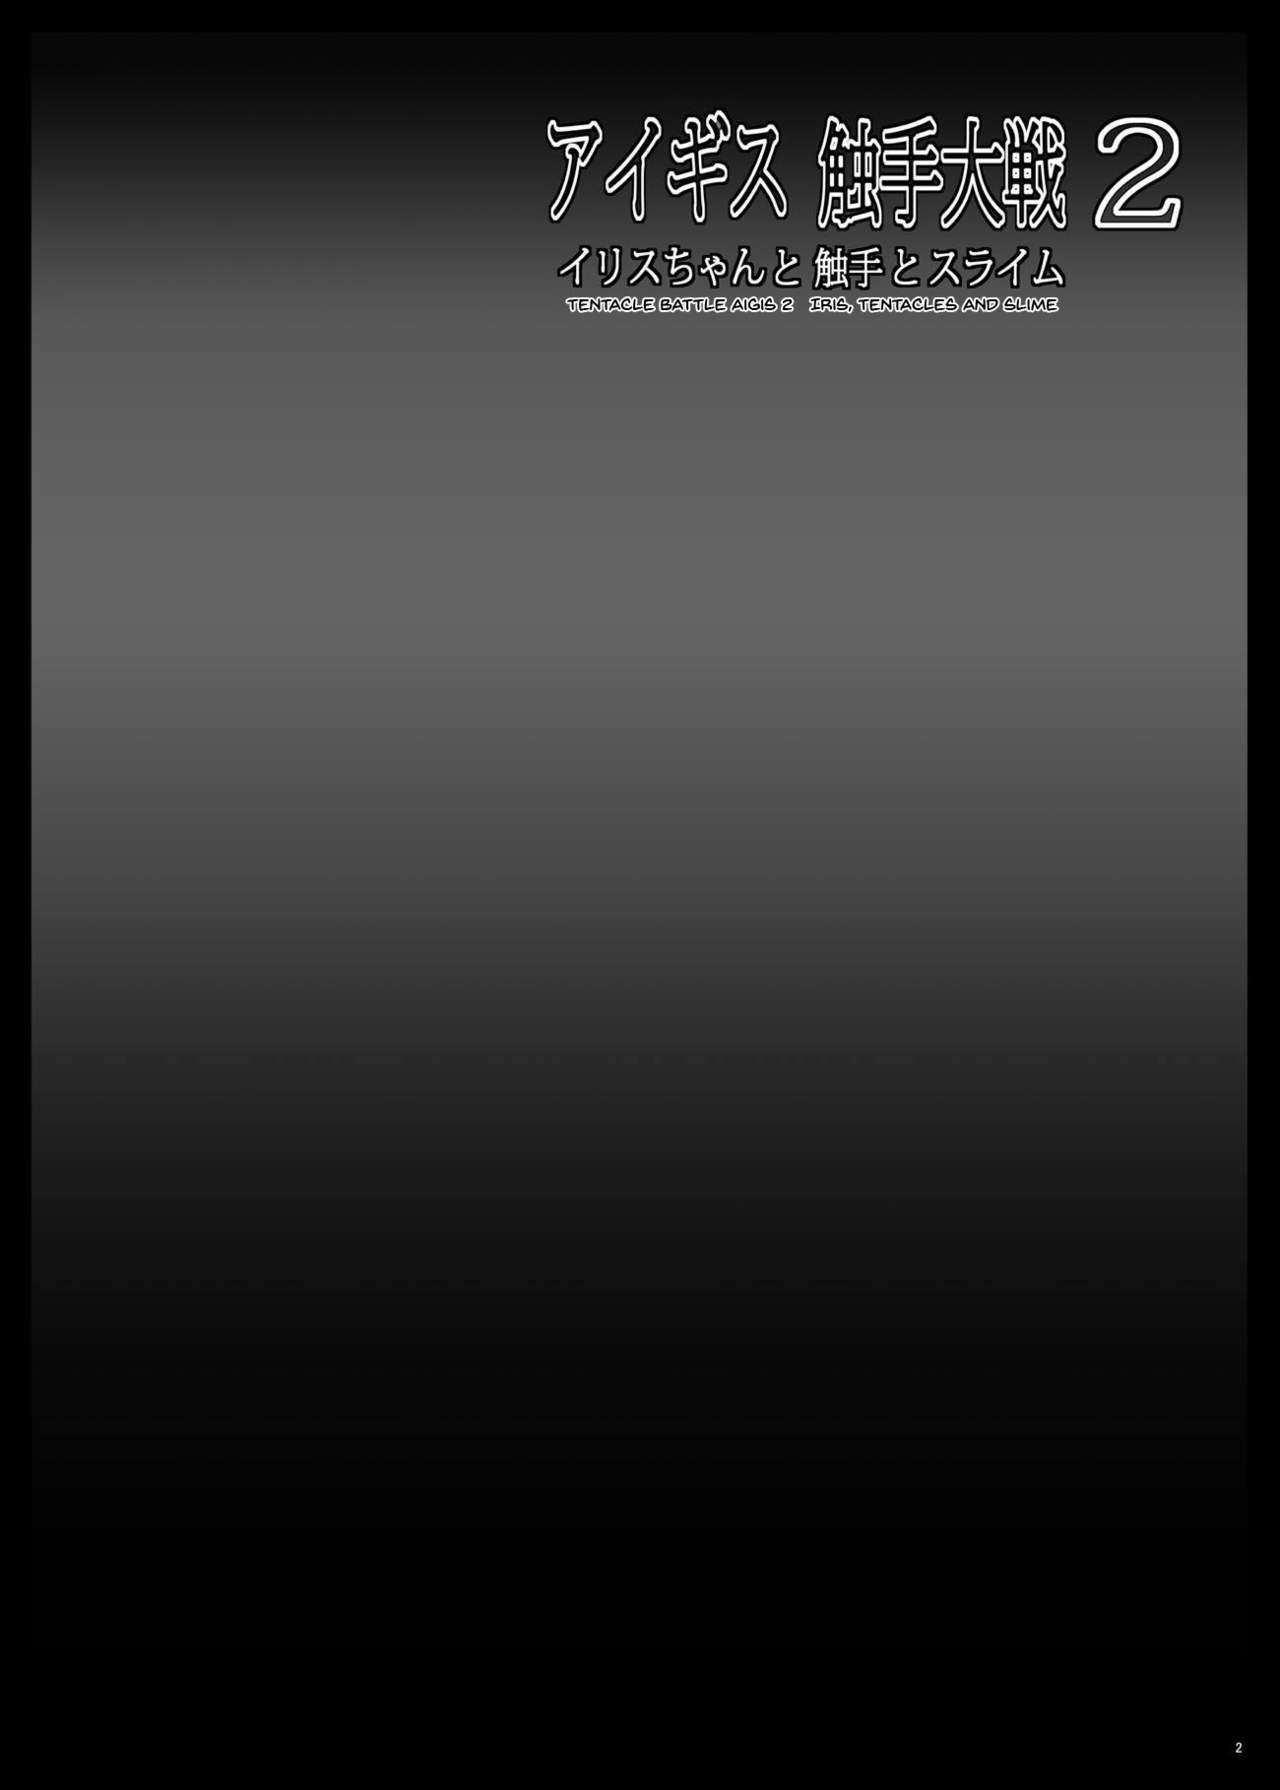 [Shinchara (YO-JIN)] Aigis Shokushu Taisen 2 - Elyse-chan to Shokushu to Slime | Aigis Tentacle Battle 2 - Elyse-chan And The Tentacle Slime (Sennen Sensou Aigis) [English] {Doujins.com} [Digital] 2